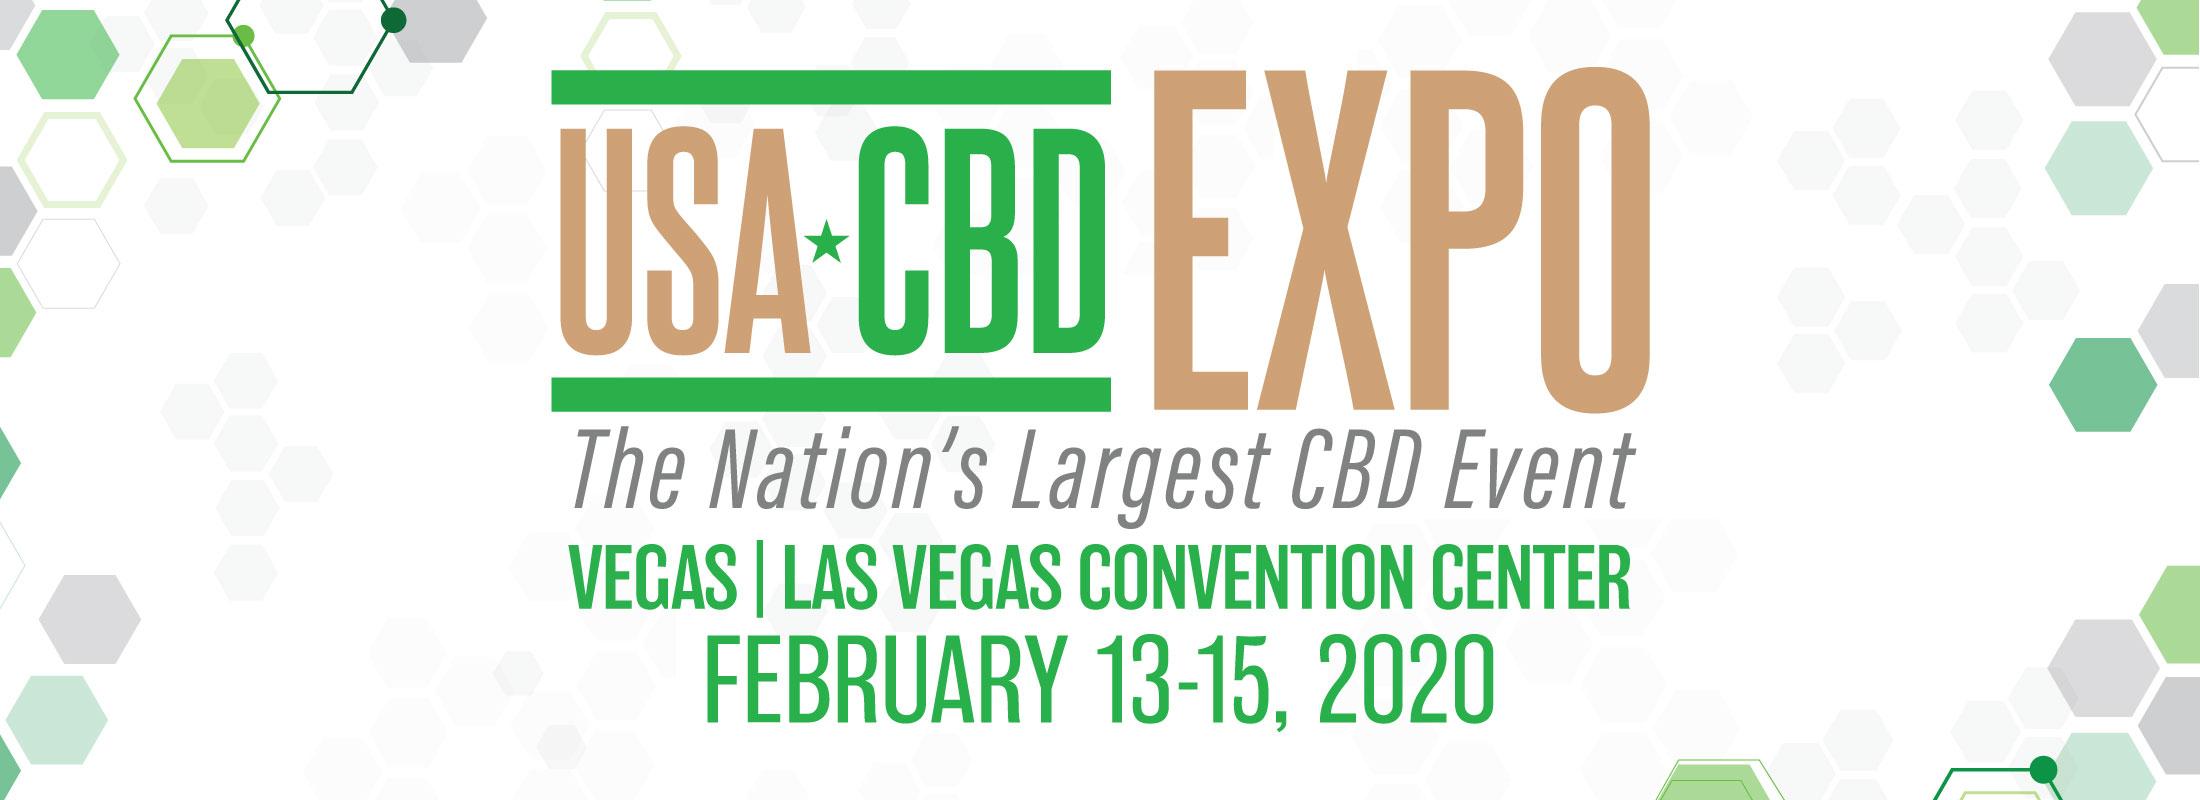 USA CBD Expo Vegas